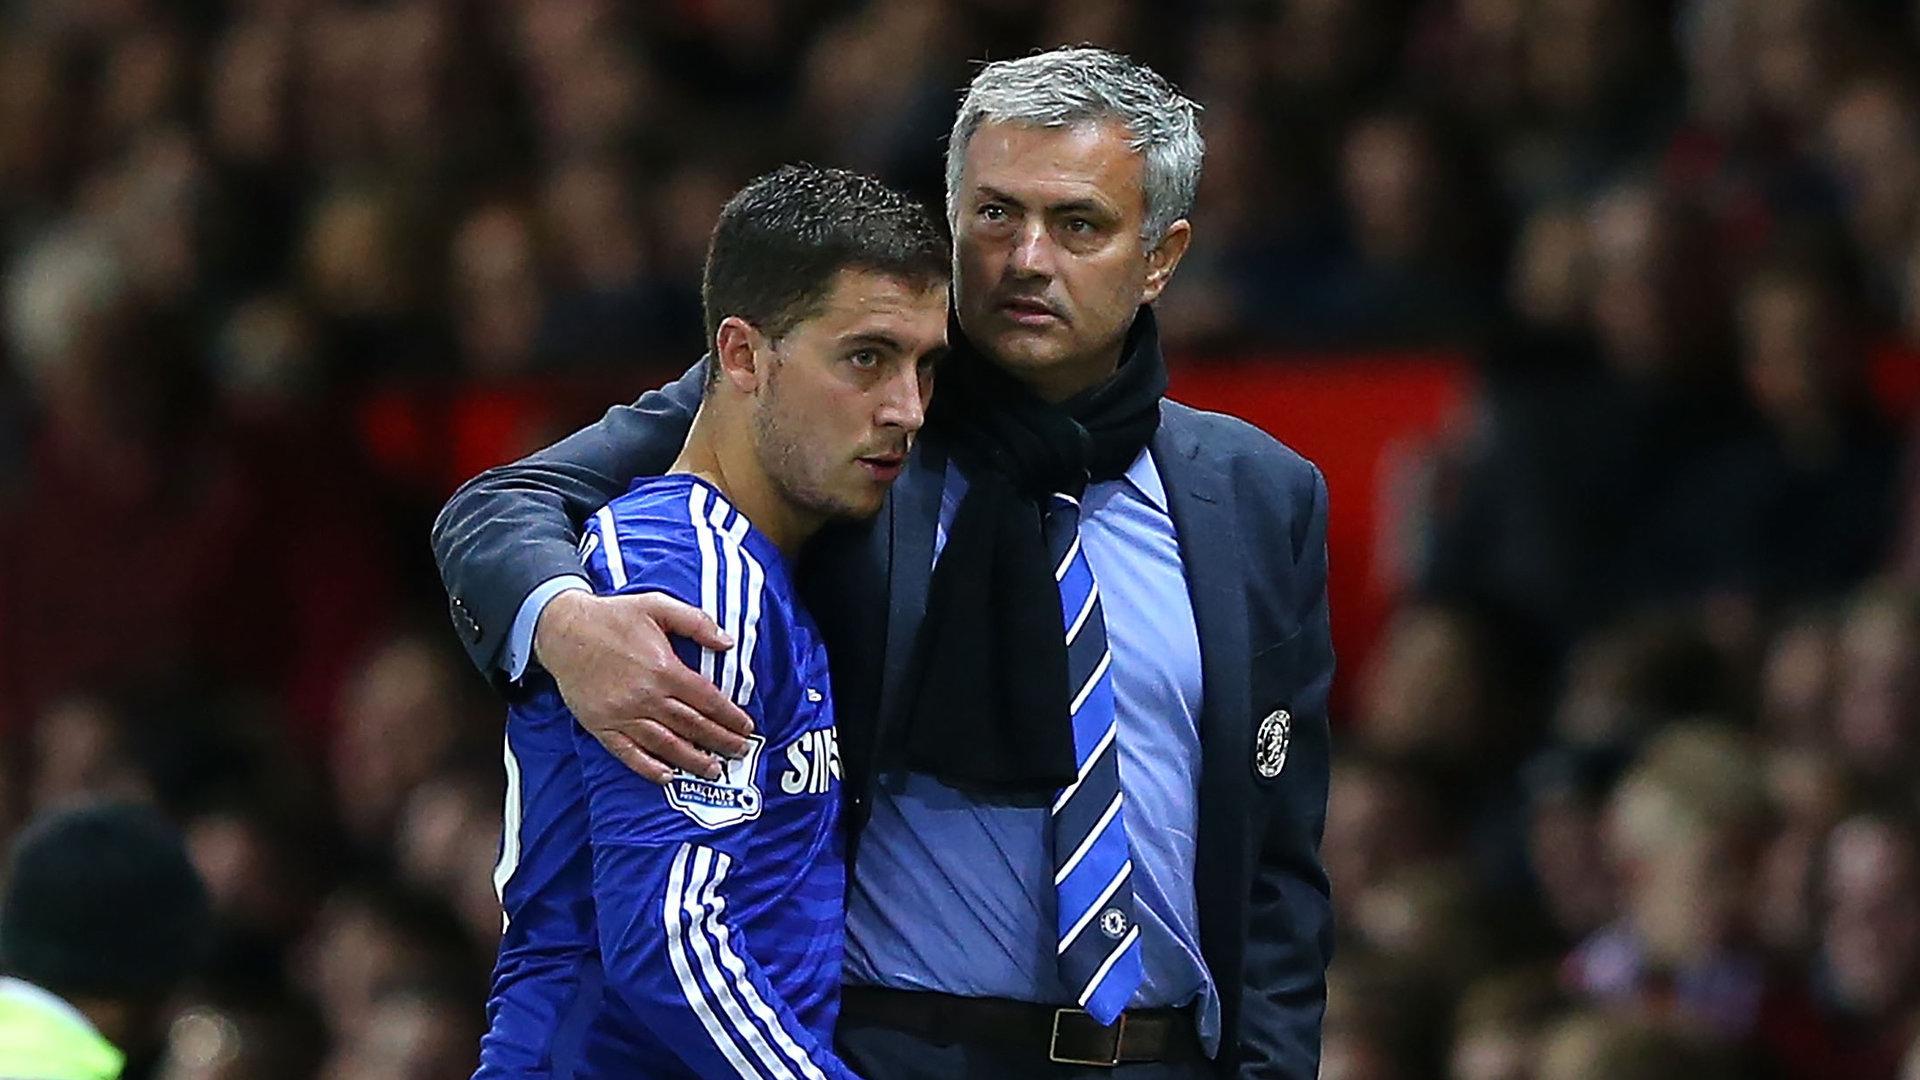 Chelsea's Jose Mourinho and Eden Hazard